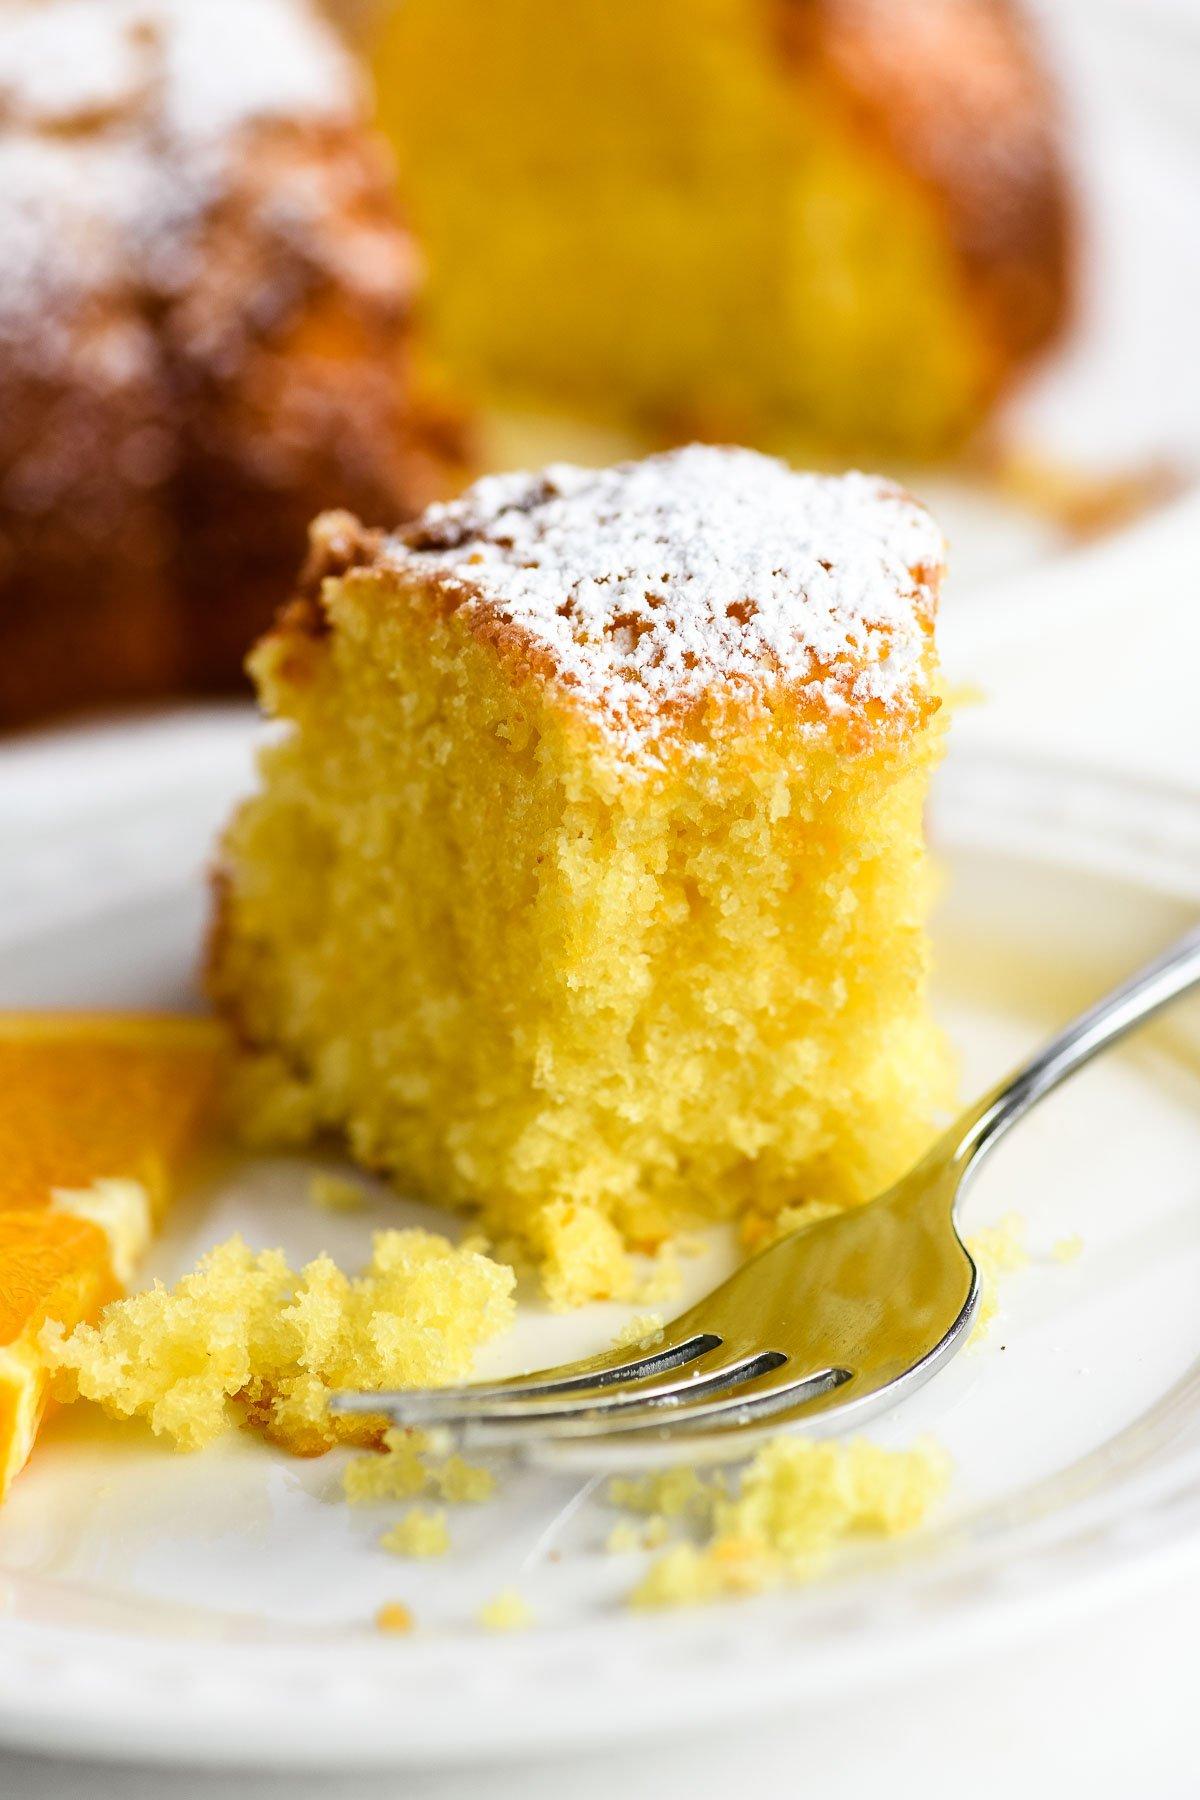 Taking a bite from a fresh orange bundt cake